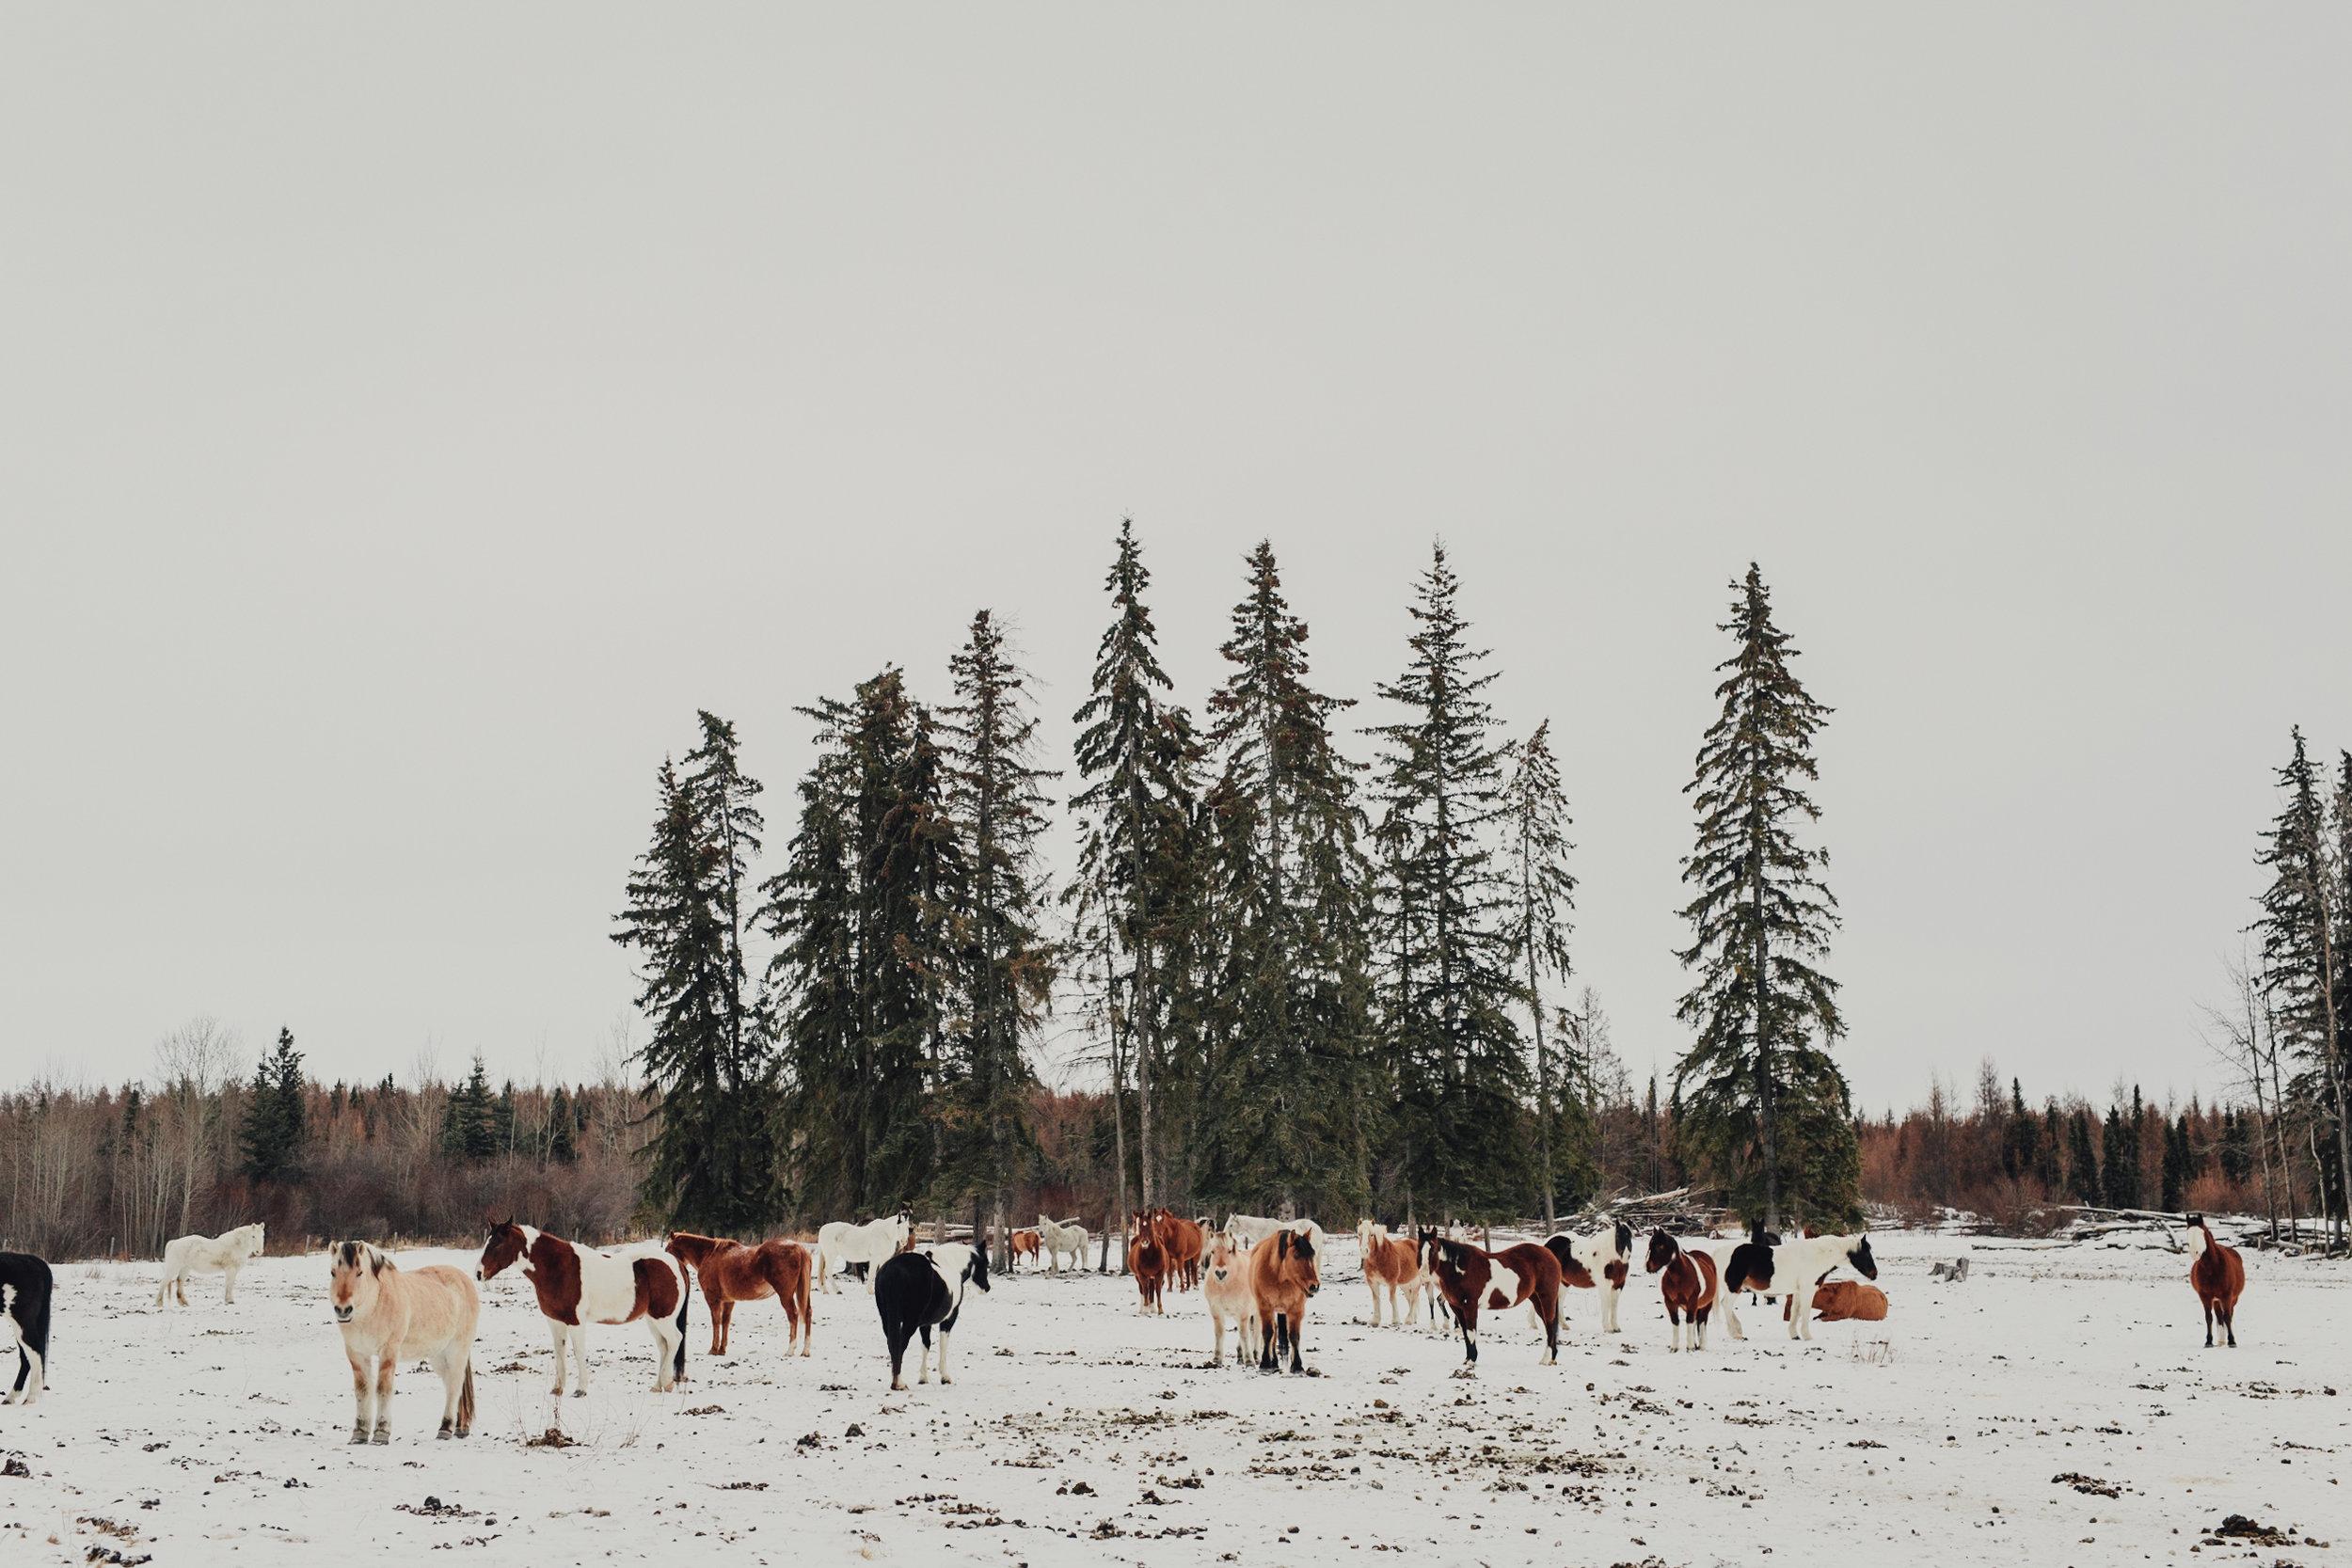 Vacations-of-the-Brave-Alberta-0141.JPG